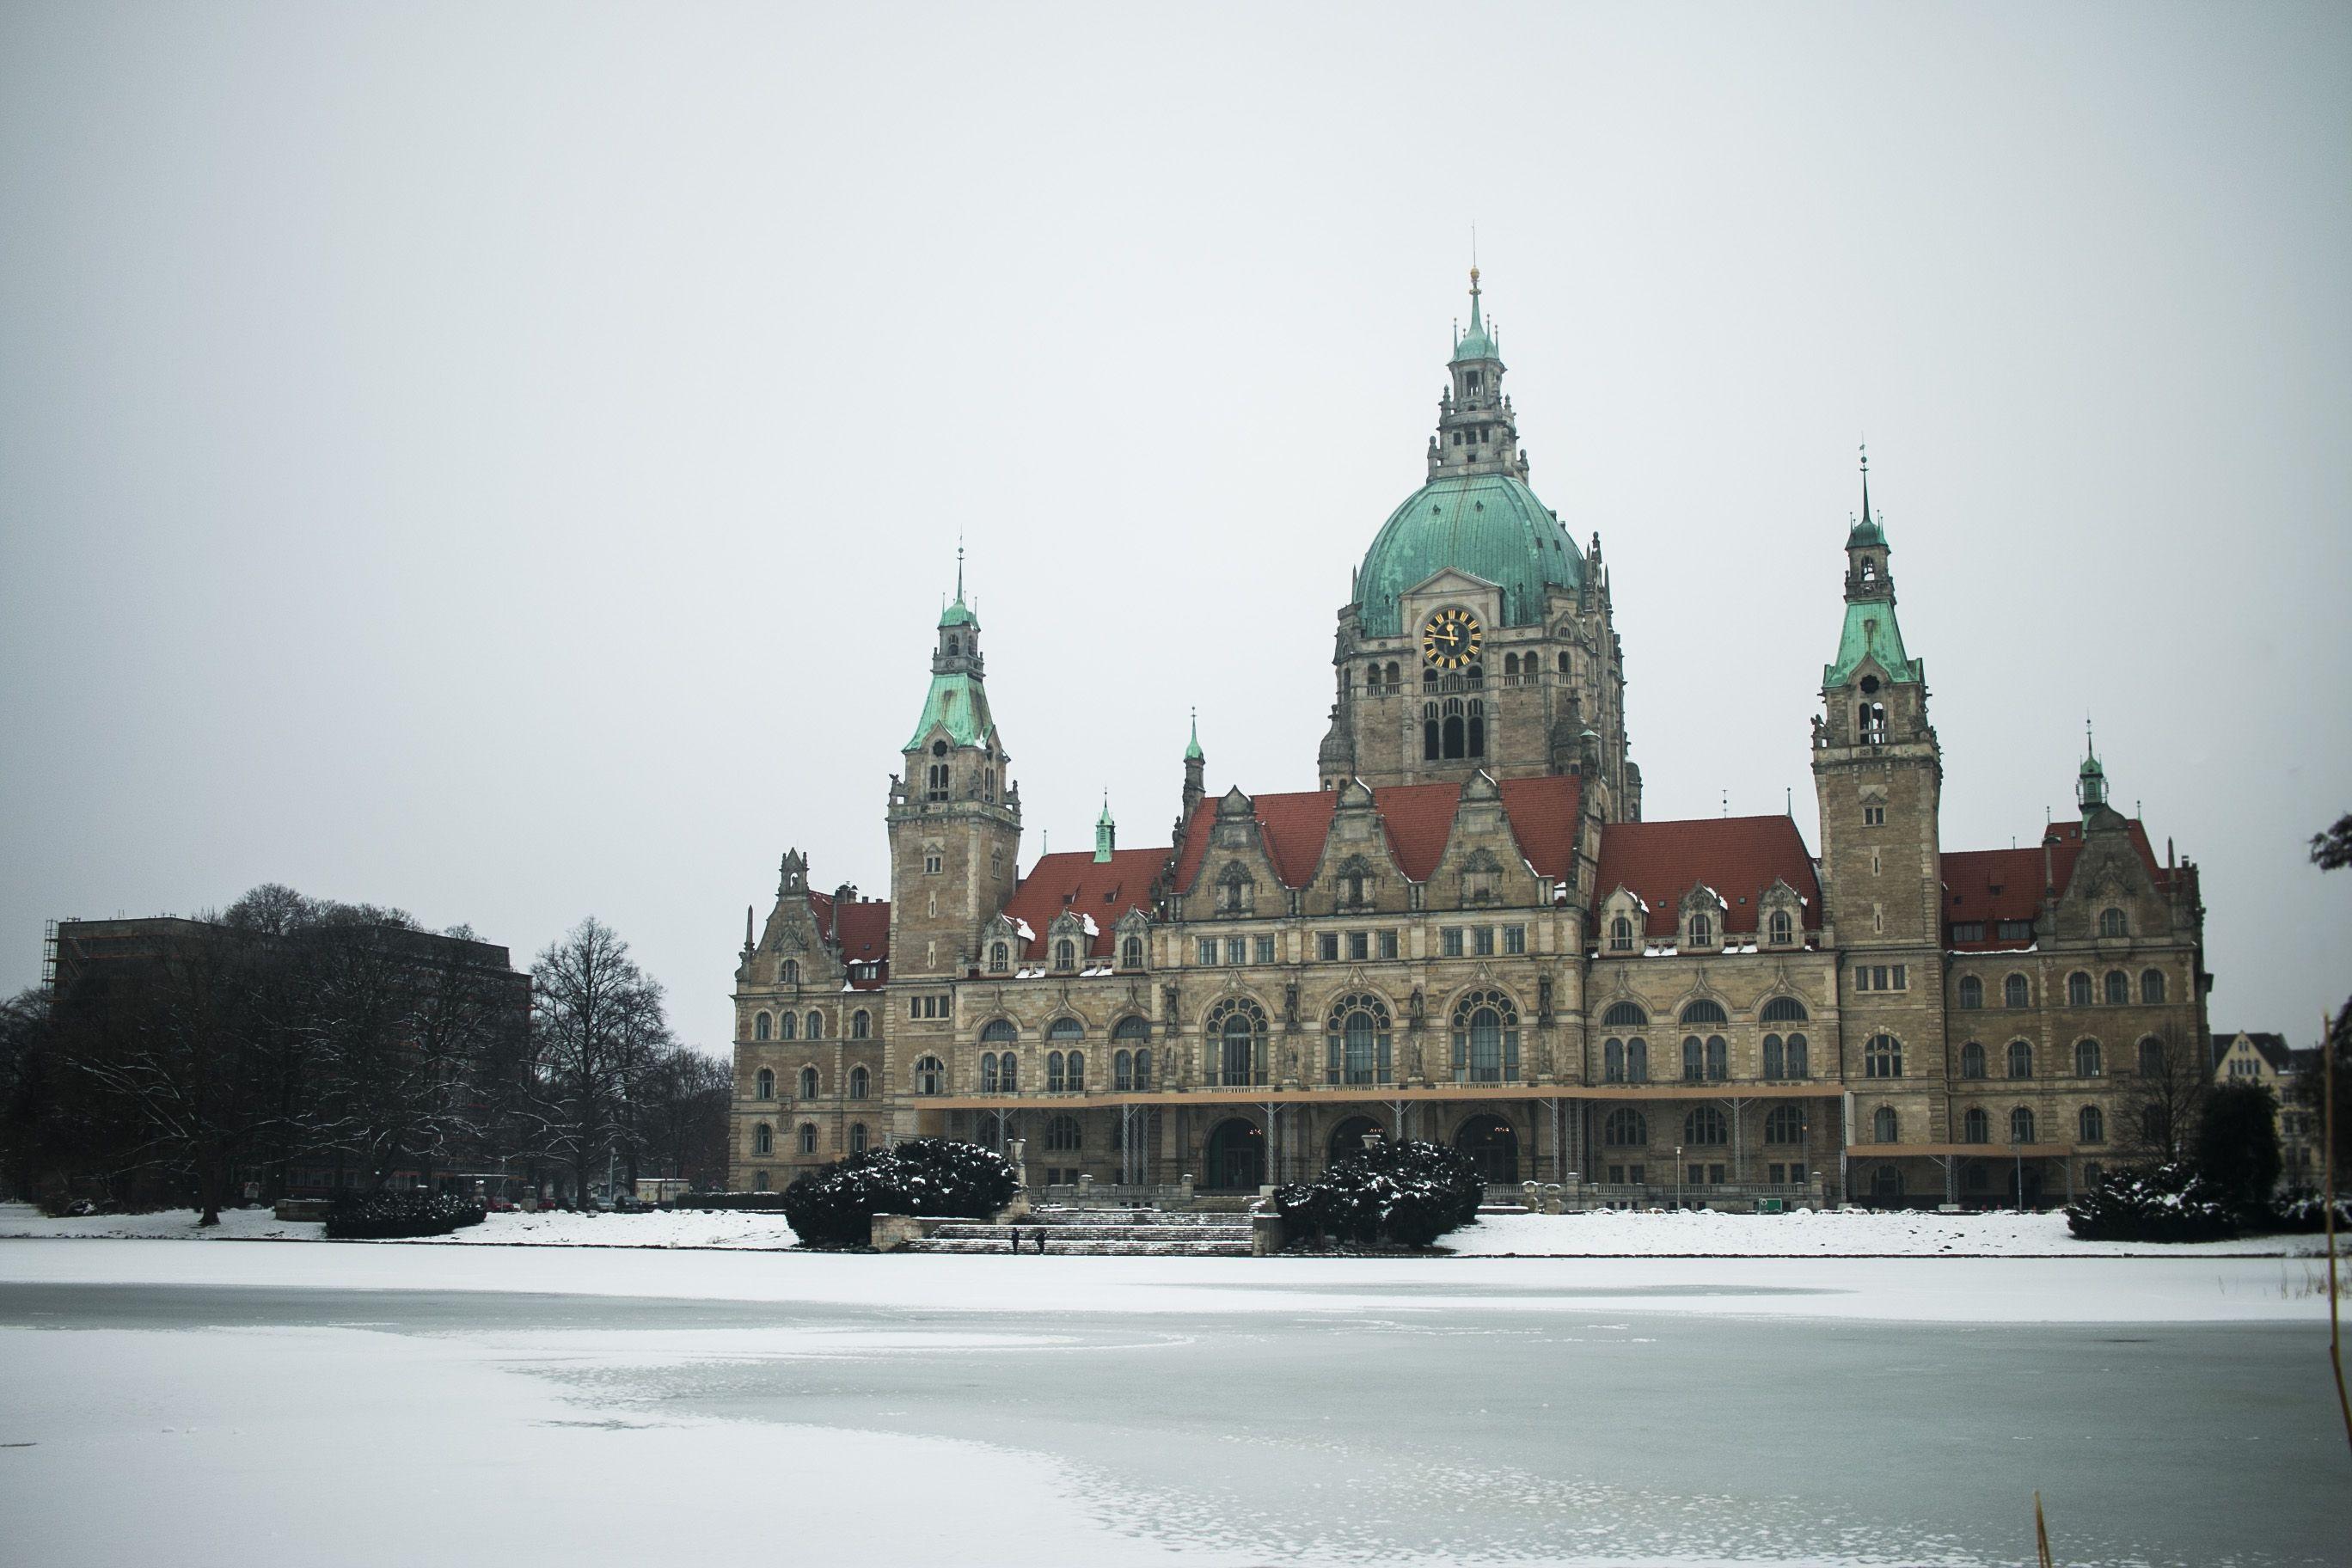 #Rathaus - #Hannover www.azucarundkalt.com